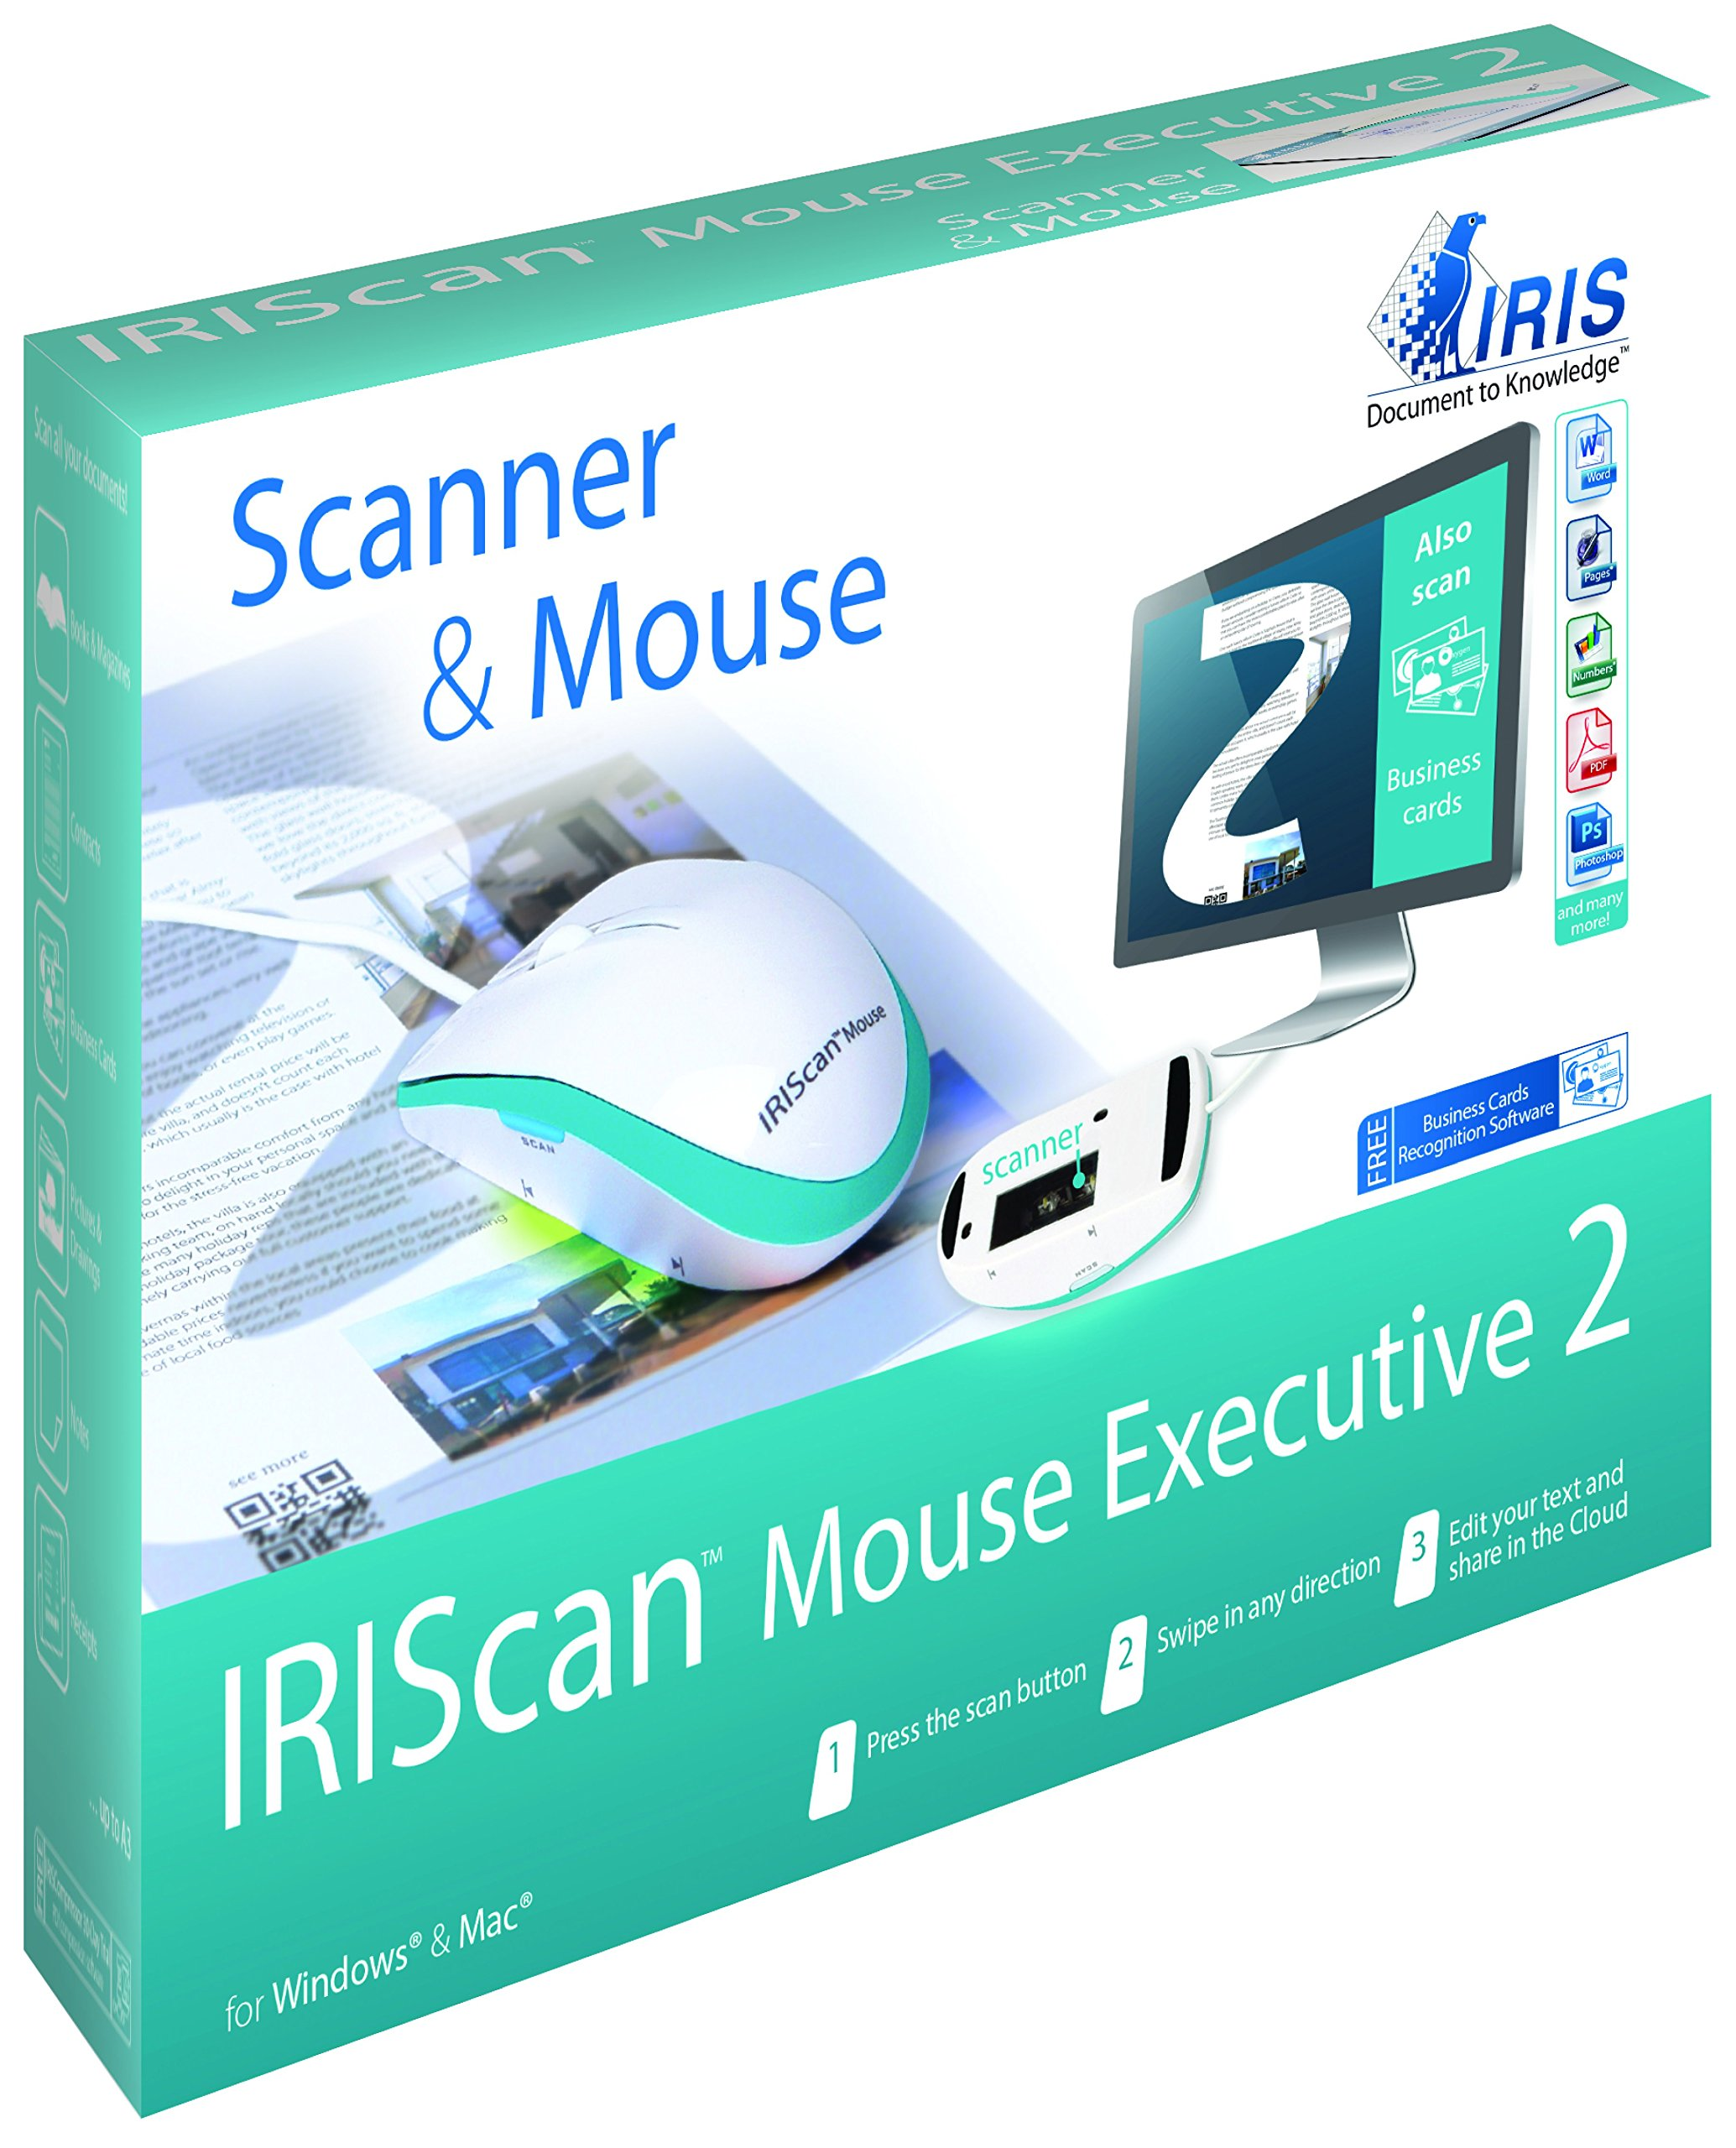 IRIScan Executive 2 Portable Scanning Mouse by IRIS USA, Inc.